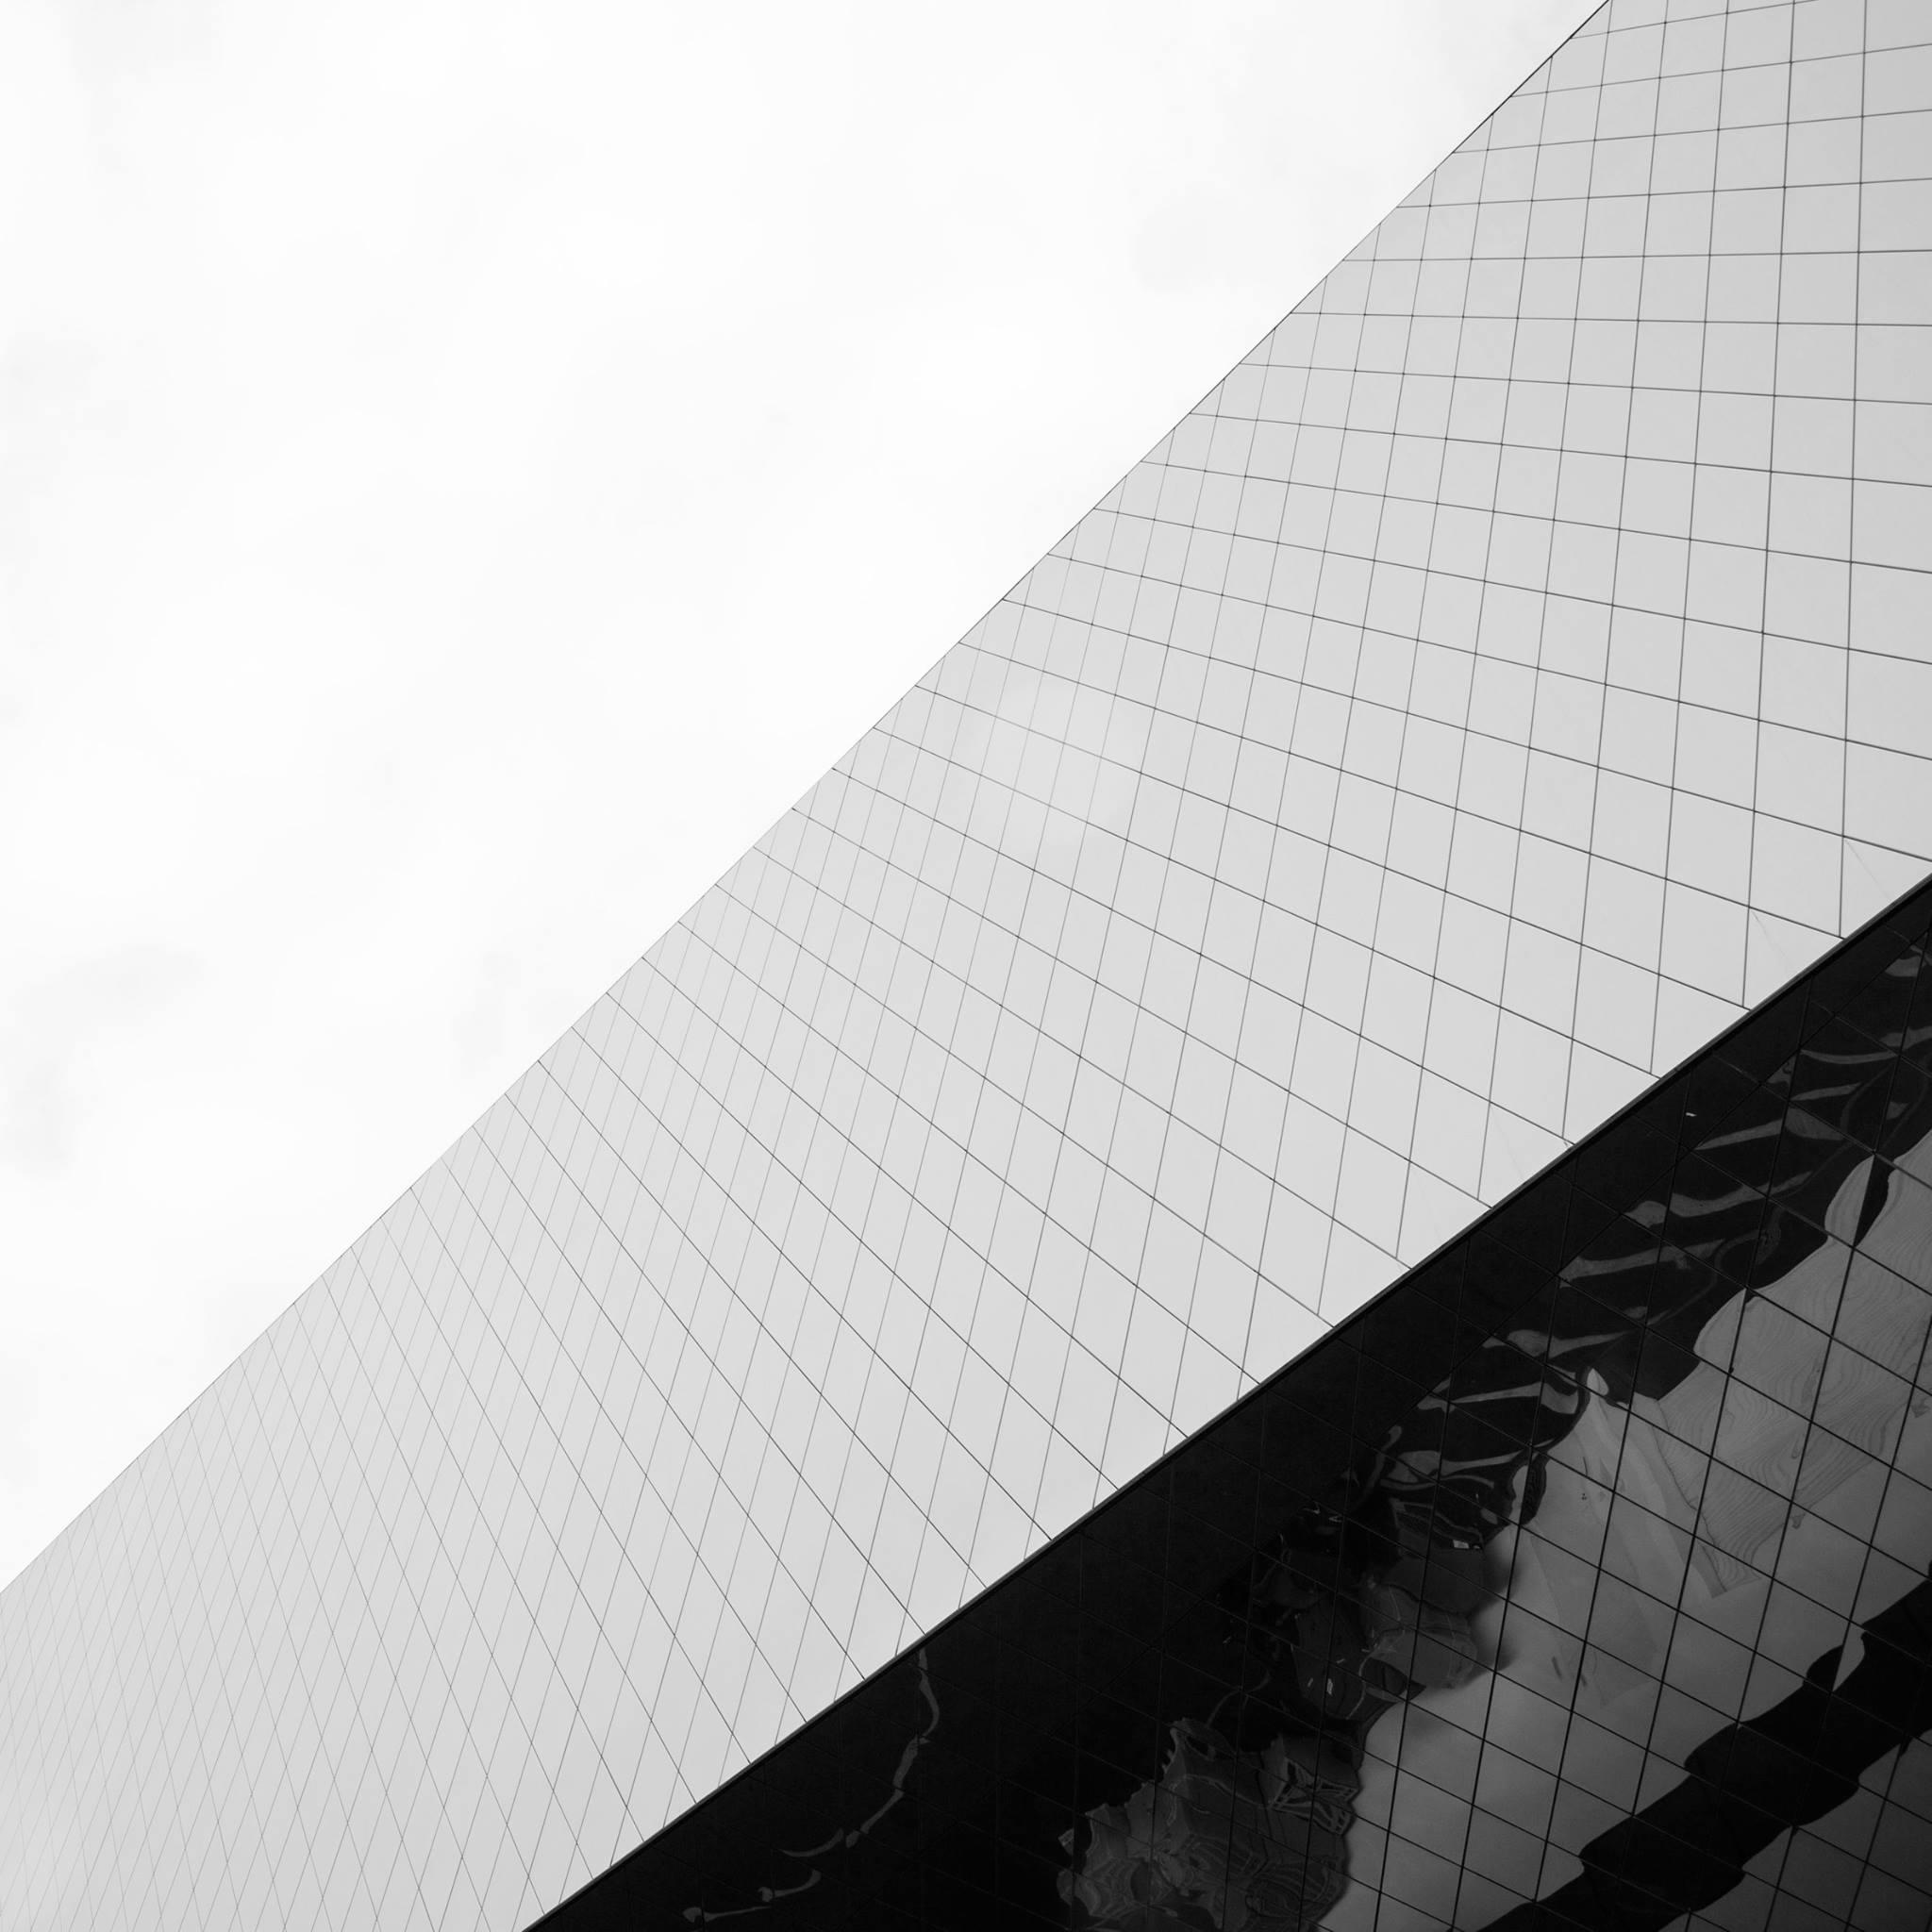 kevin-krautgartner-architecture-photography-04